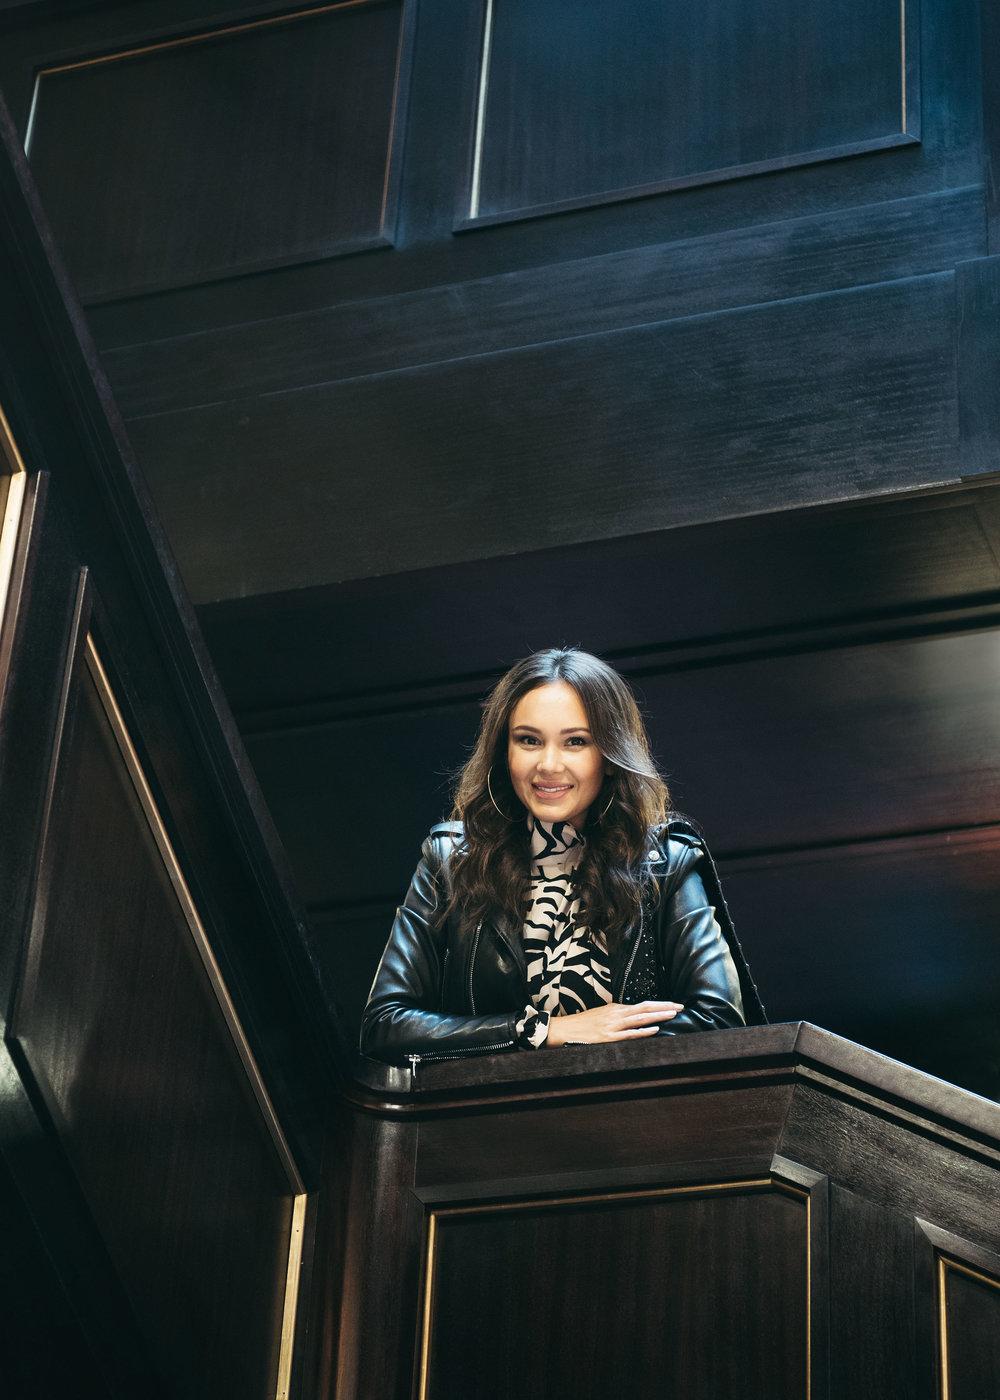 AIDA GARIFULLINA / Opernsängerin